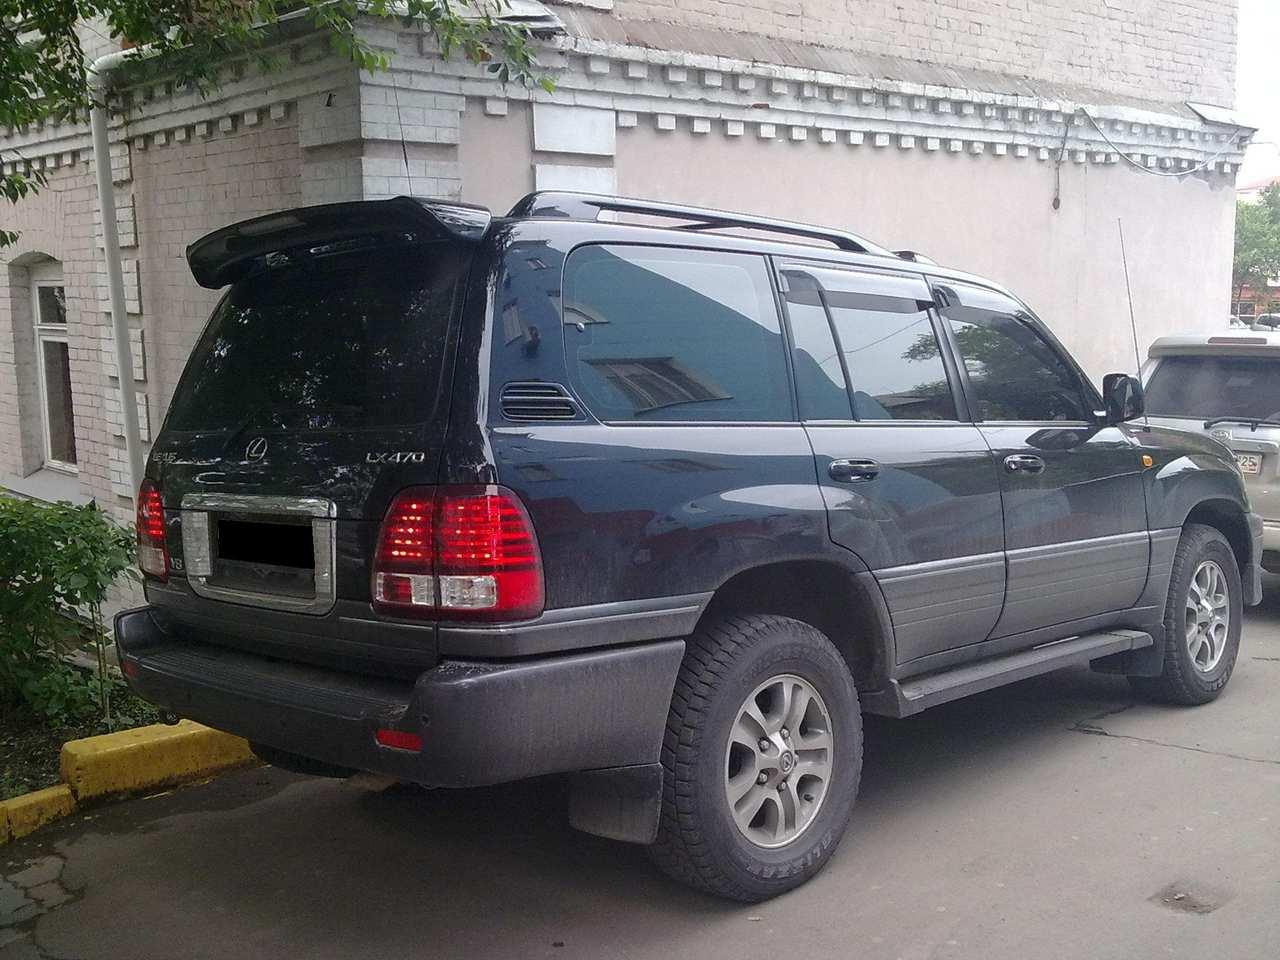 lx470 lexus 2007 enlarge